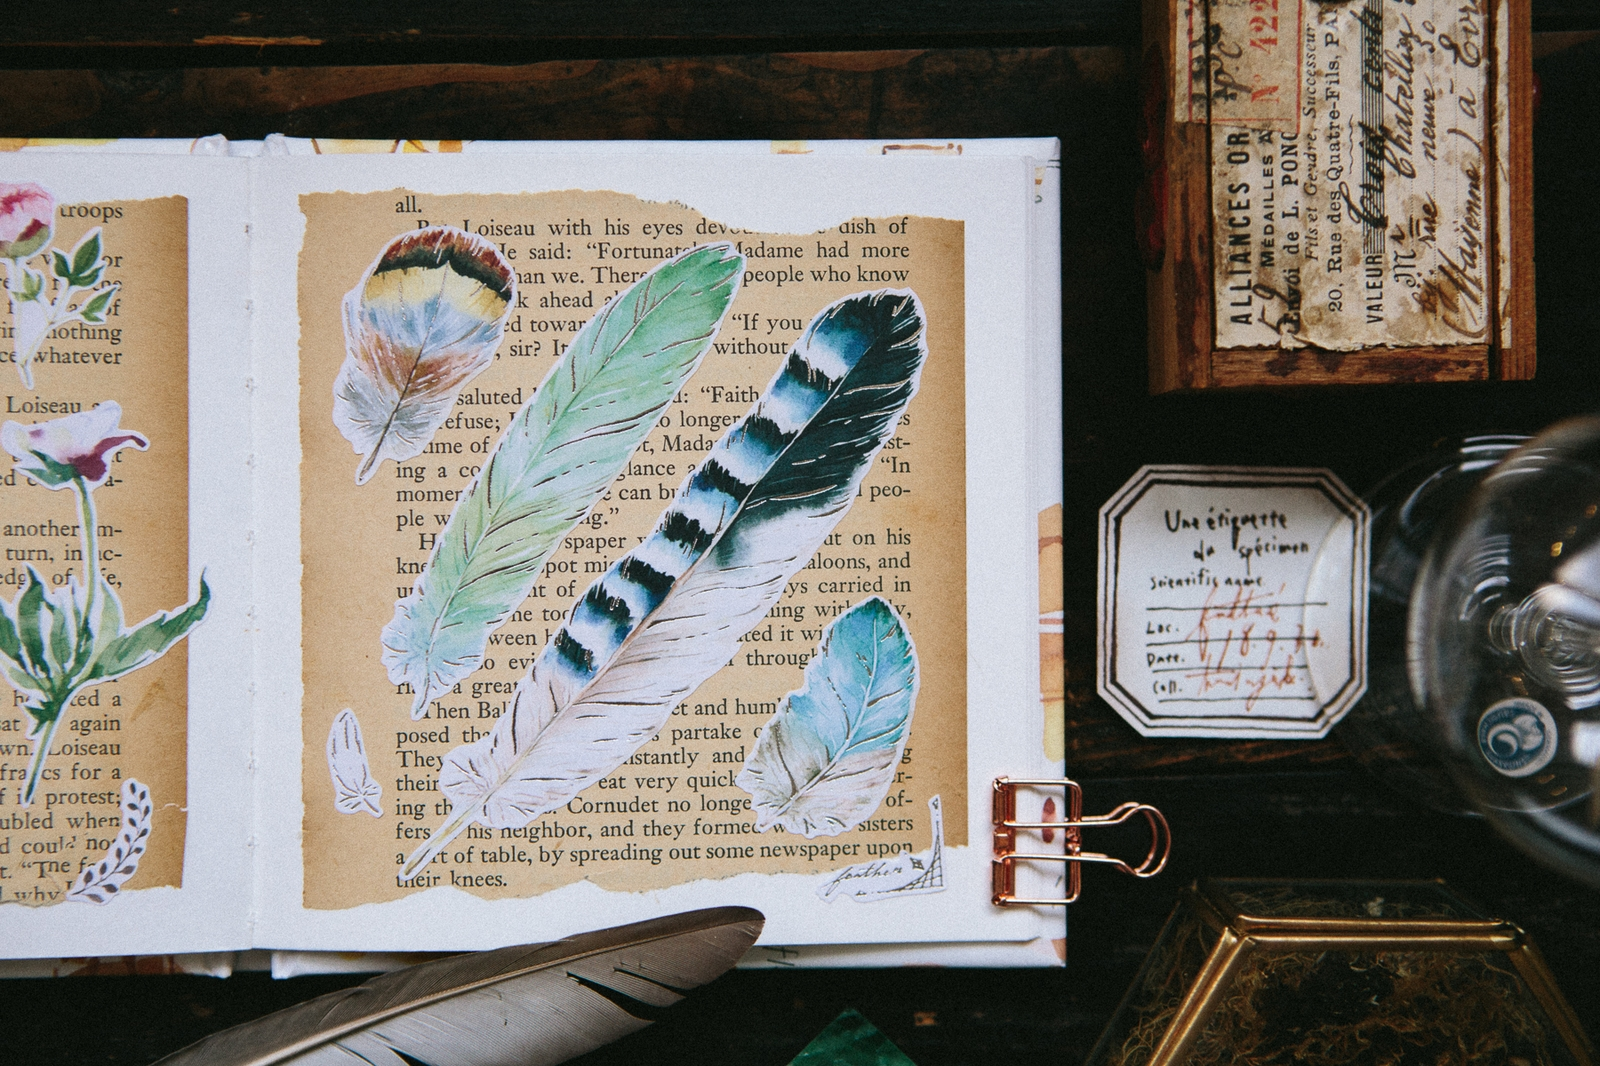 Feather 自剪貼紙